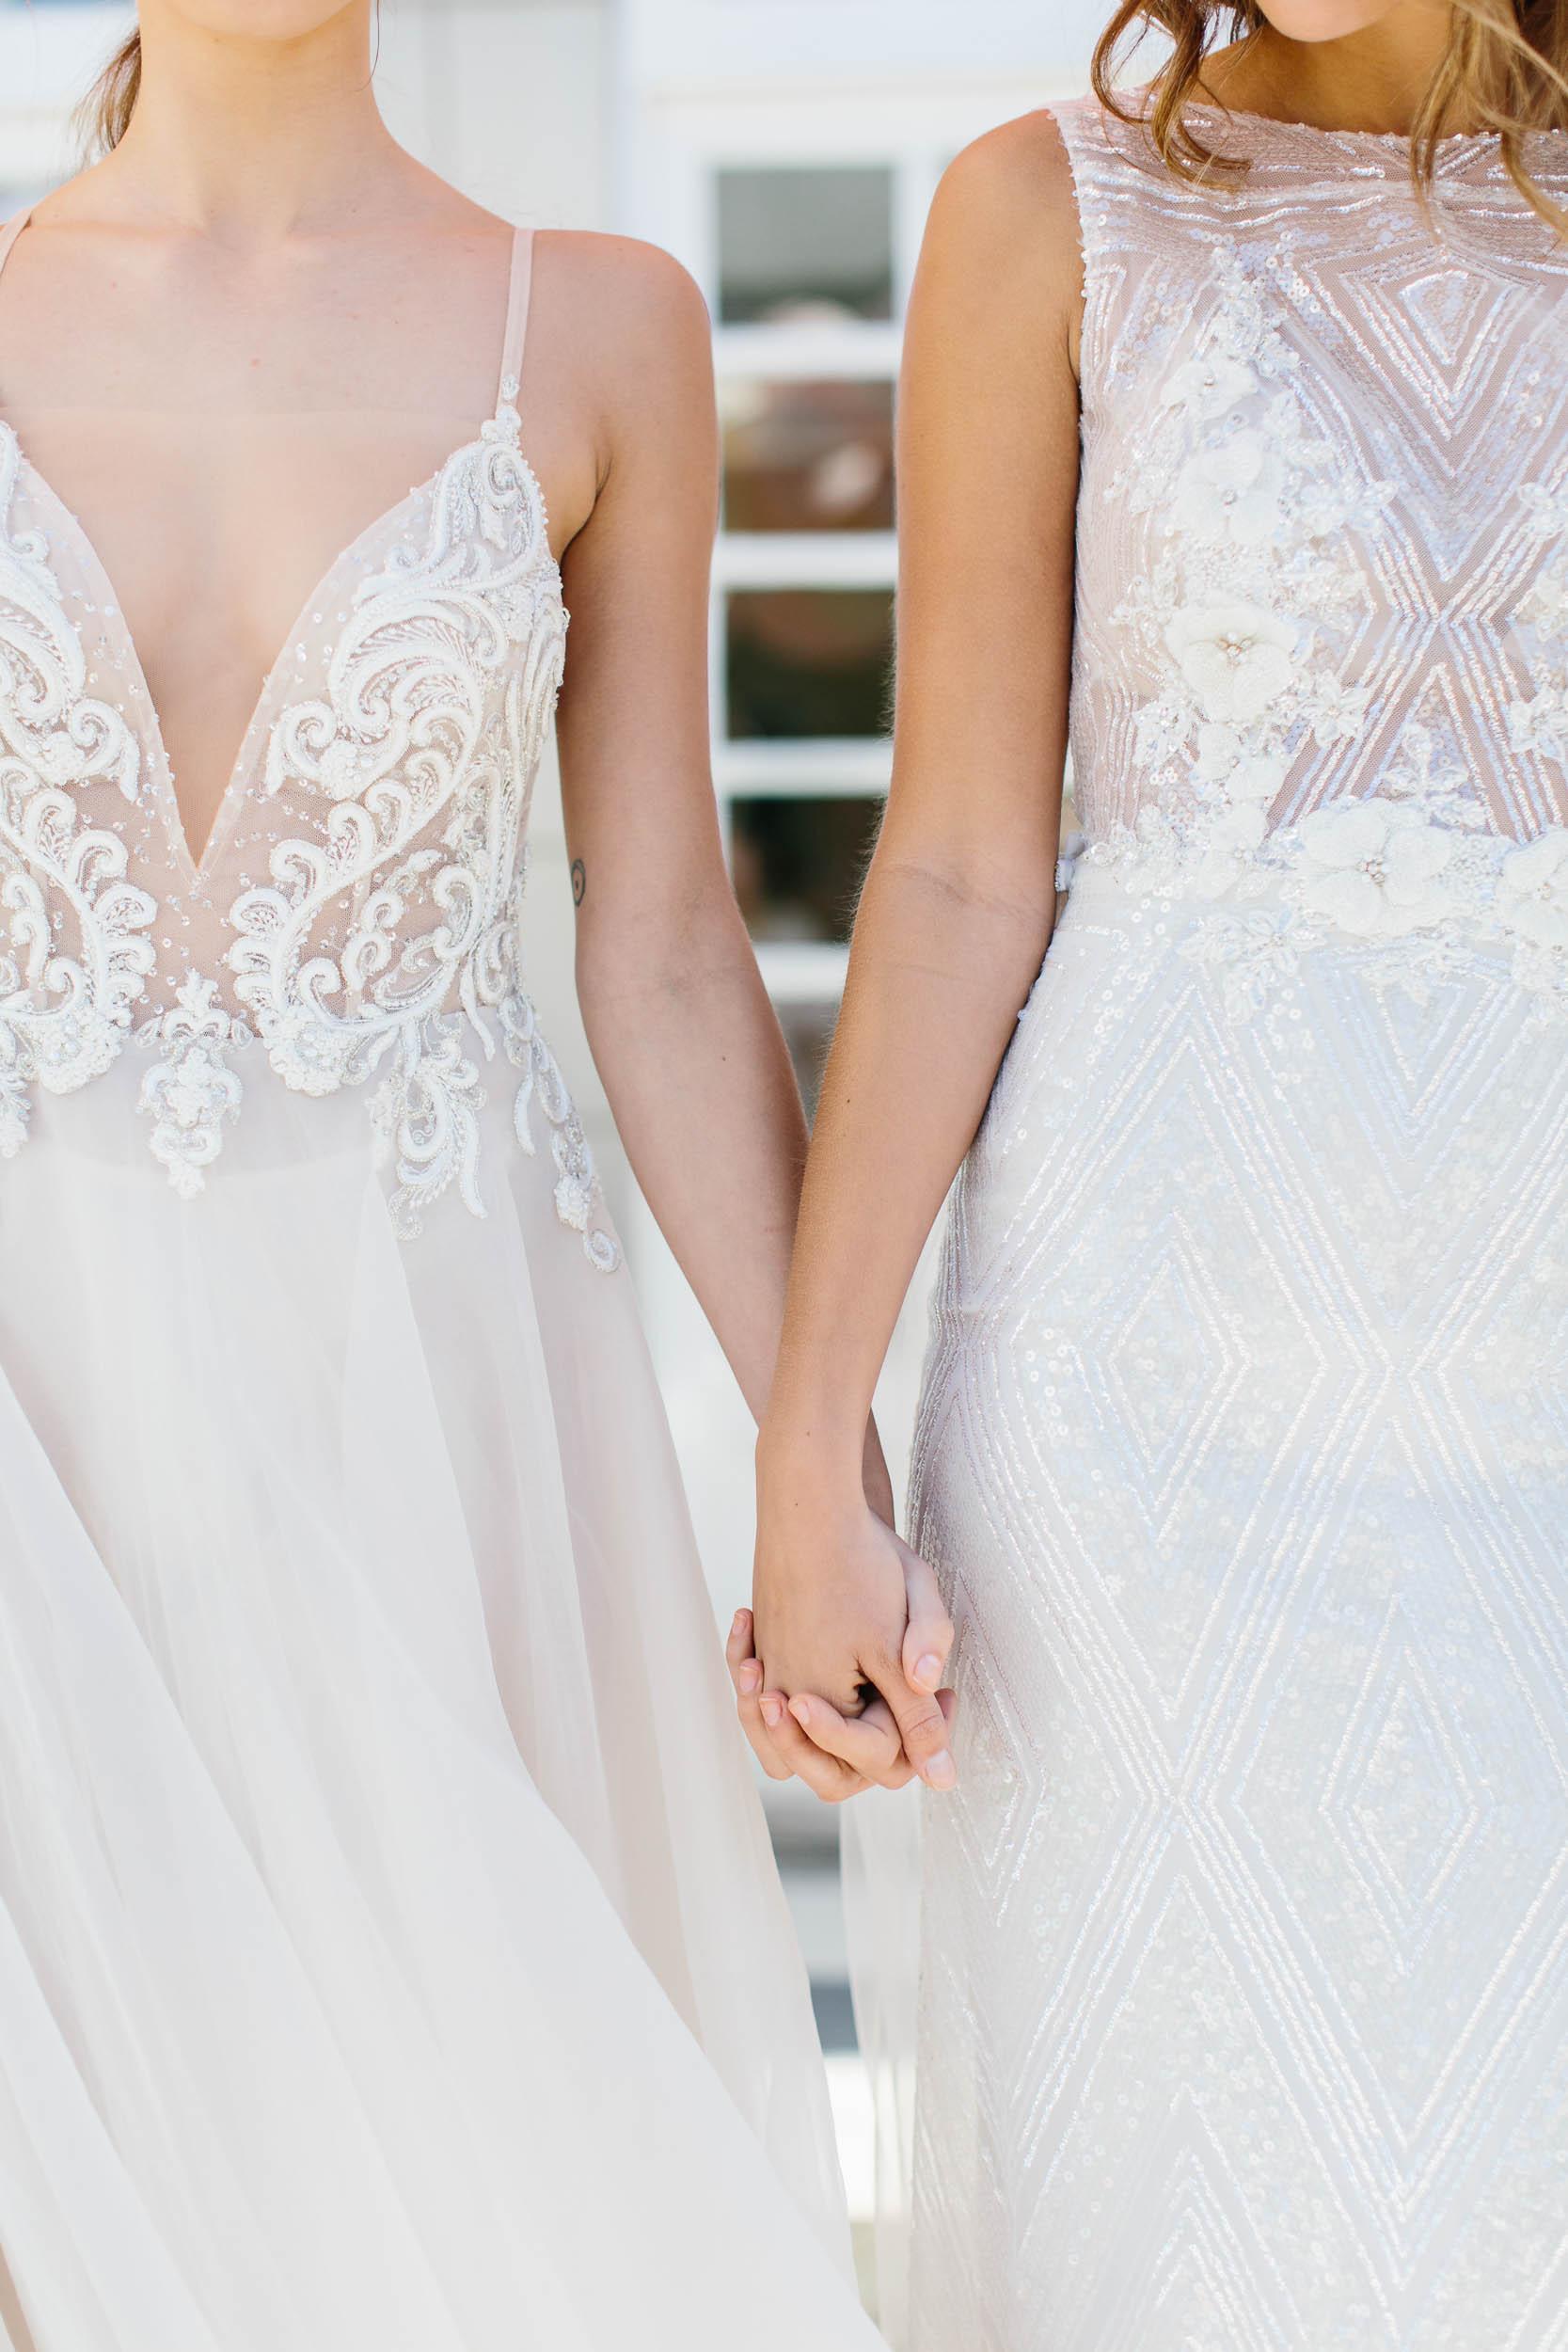 Same Sex Wedding Photo Ideas | Wedding Photography by Kas Richards